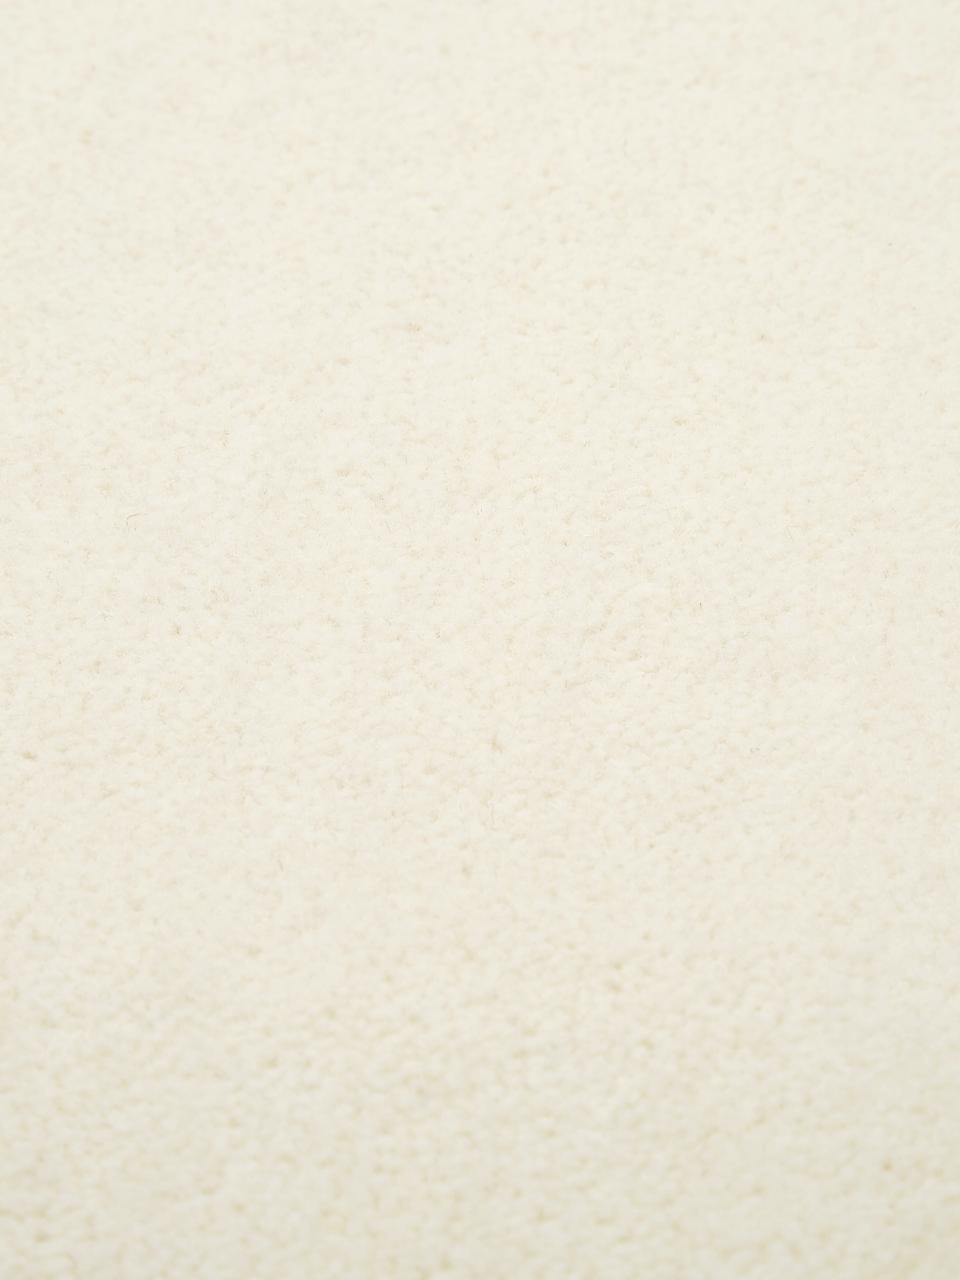 Tappeto in lana beige Ida, Retro: 60% juta, 40% poliestere, Beige, Larg. 300 x Lung. 400 cm (taglia XL)